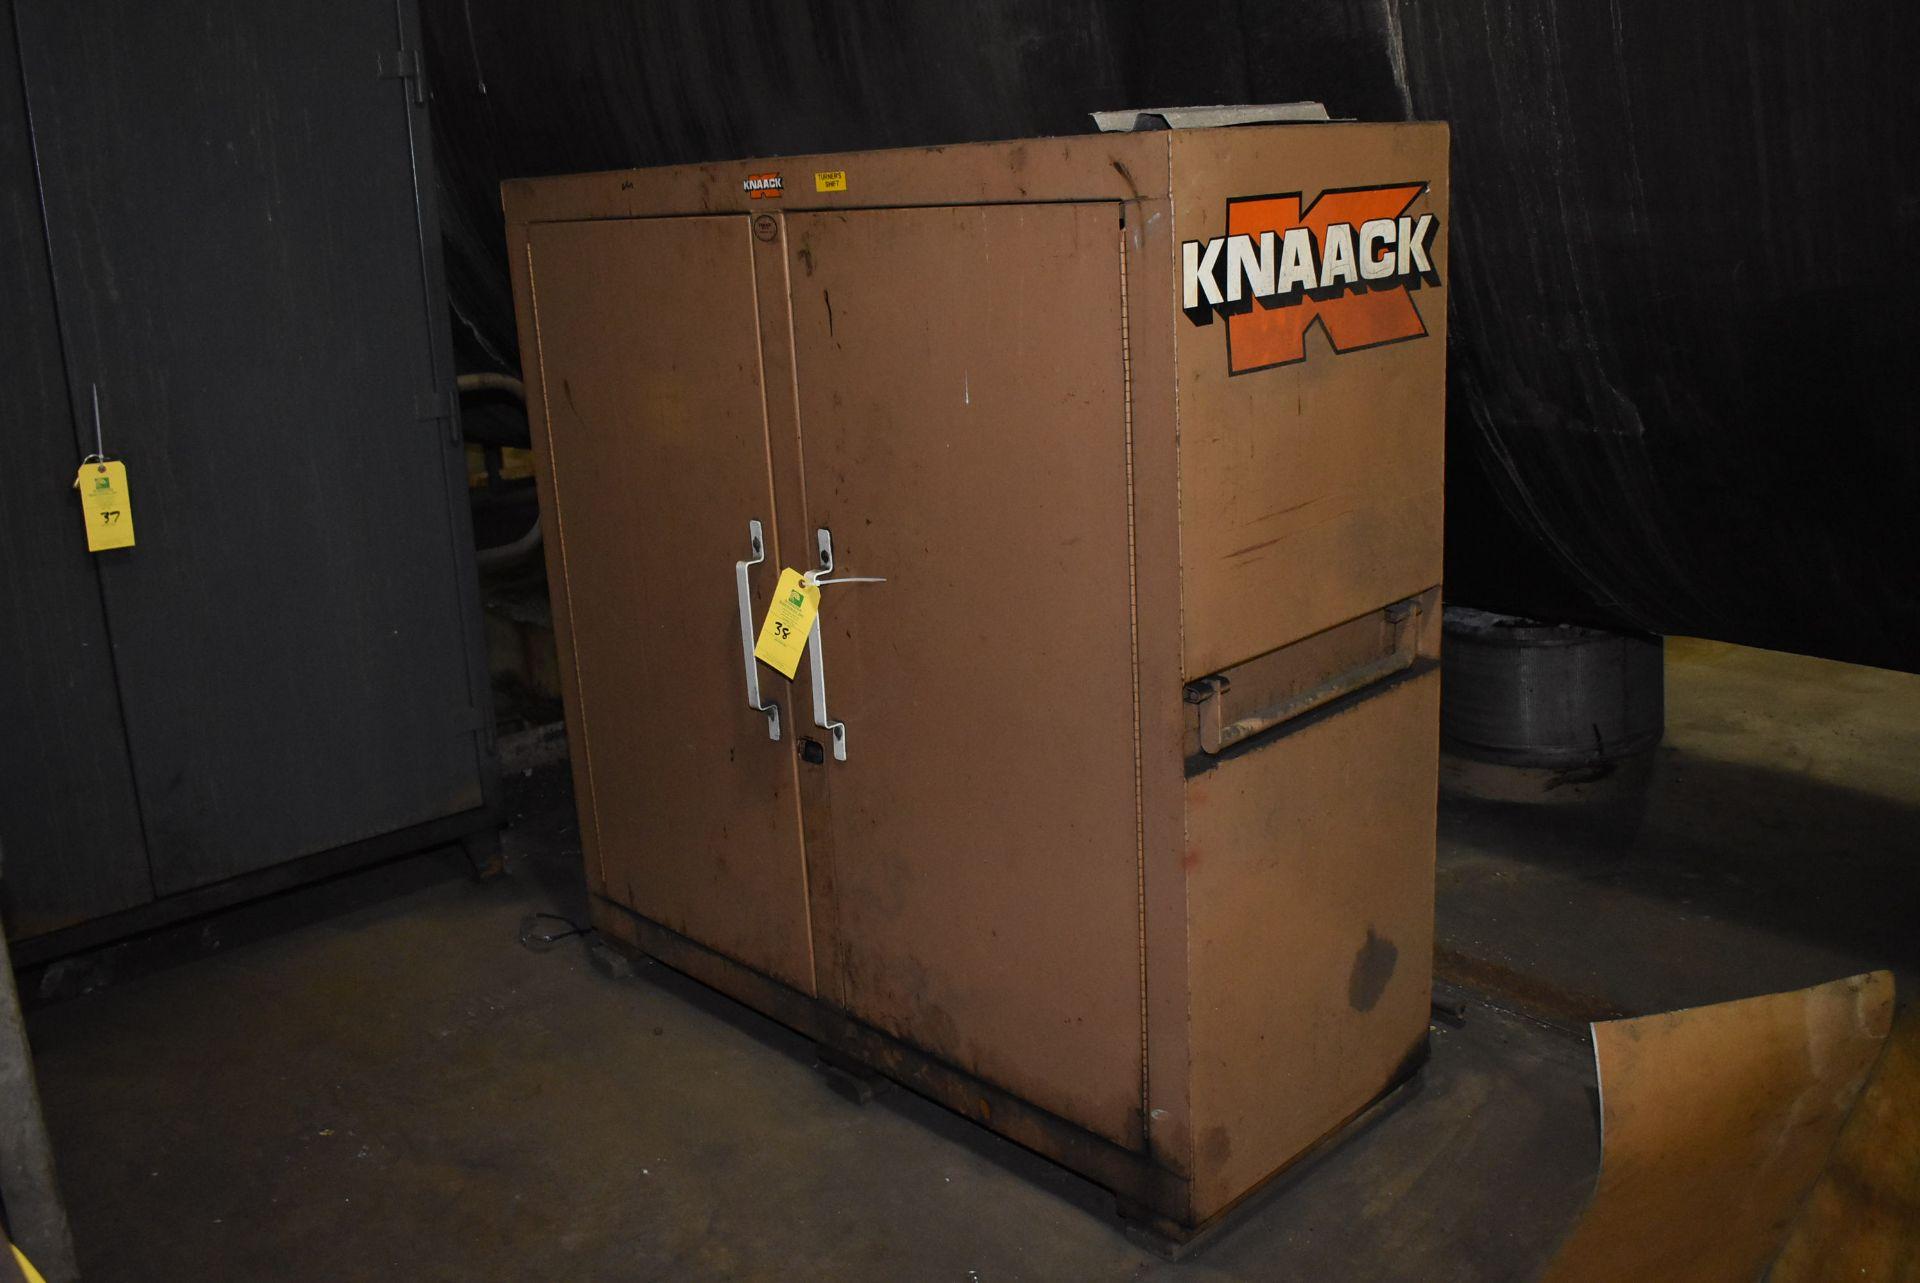 Lot 38 - Knaack Jobmaster 109 Job Box